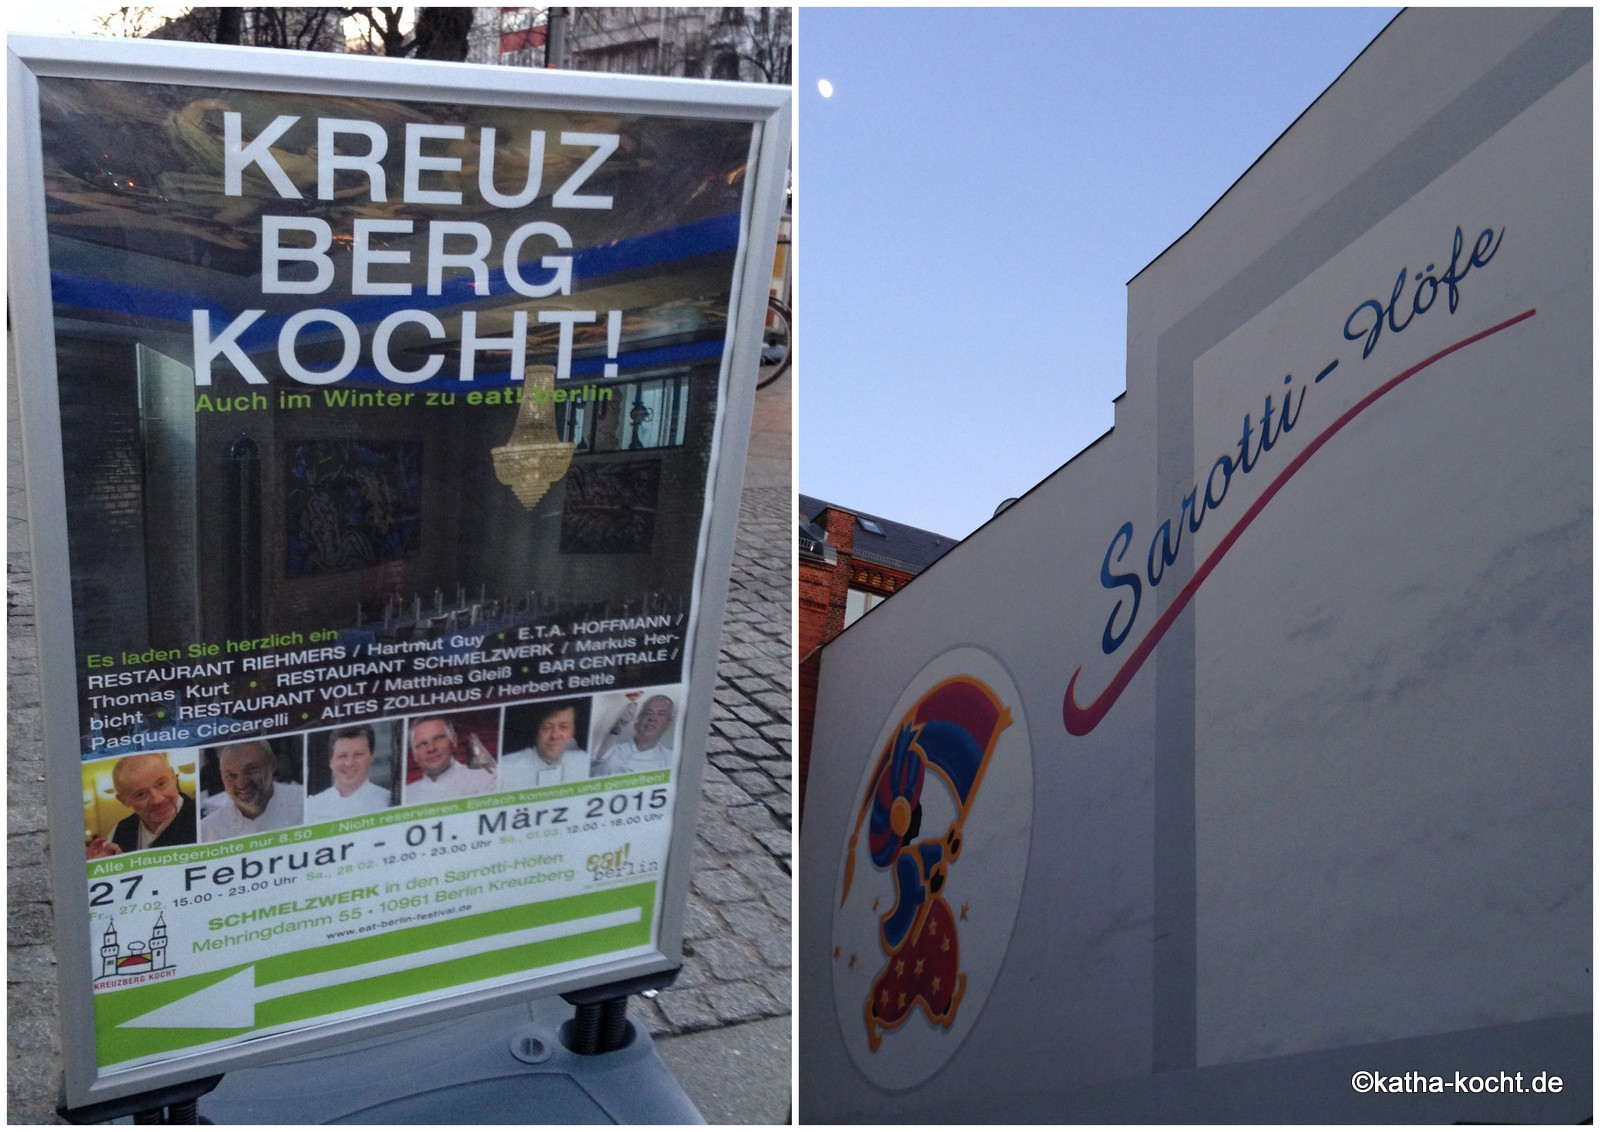 Kreuzberg kocht - im Schmelzwerk in den Sarott-Höfen